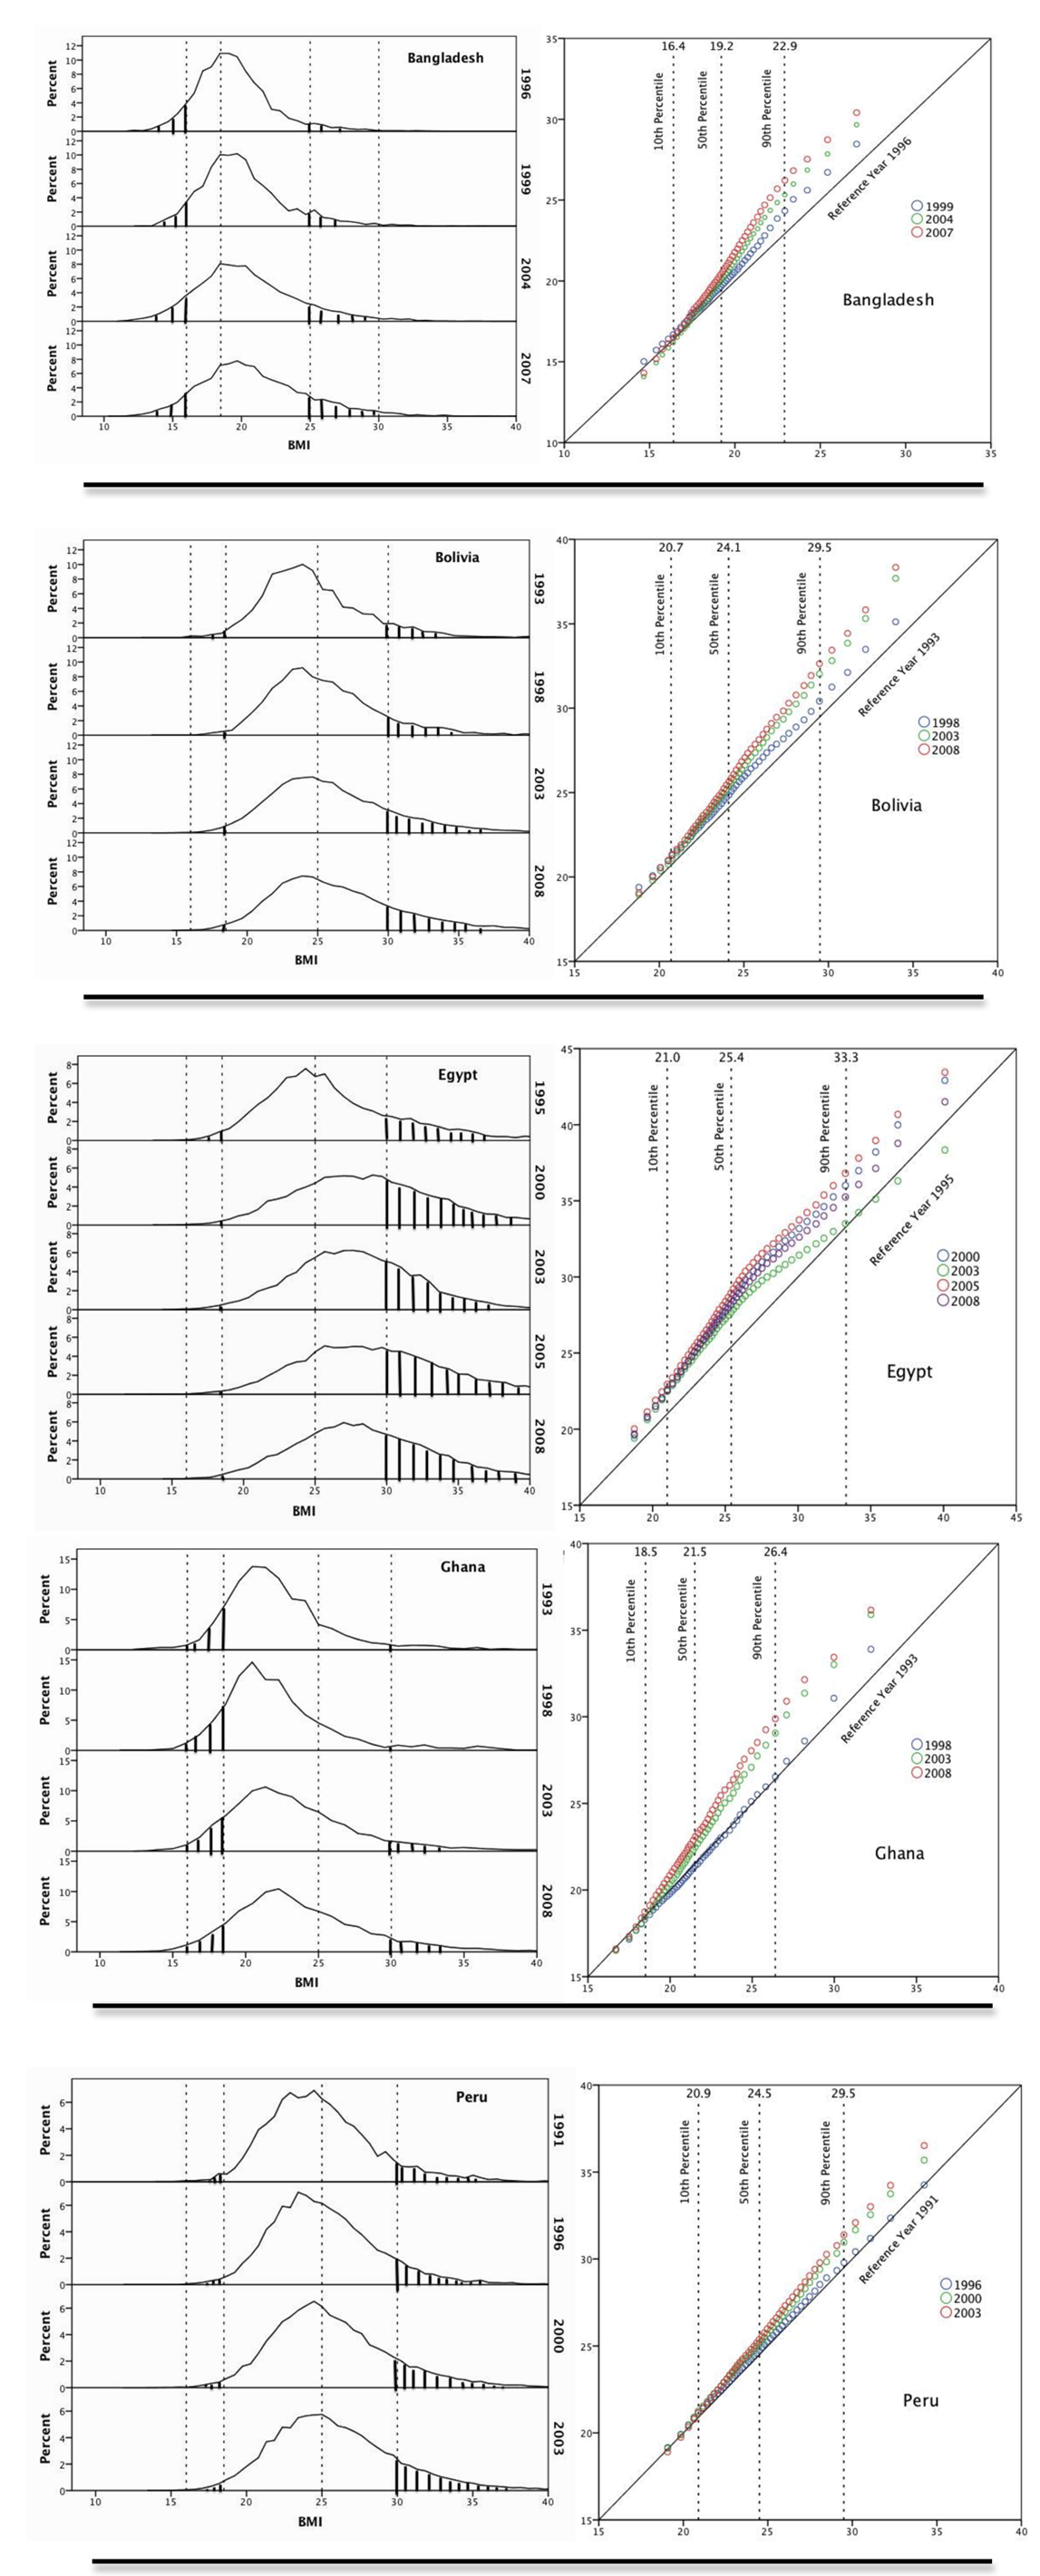 Population distribution of BMI over time in Bangladesh, Bolivia, Ghana, Peru, and Egypt.